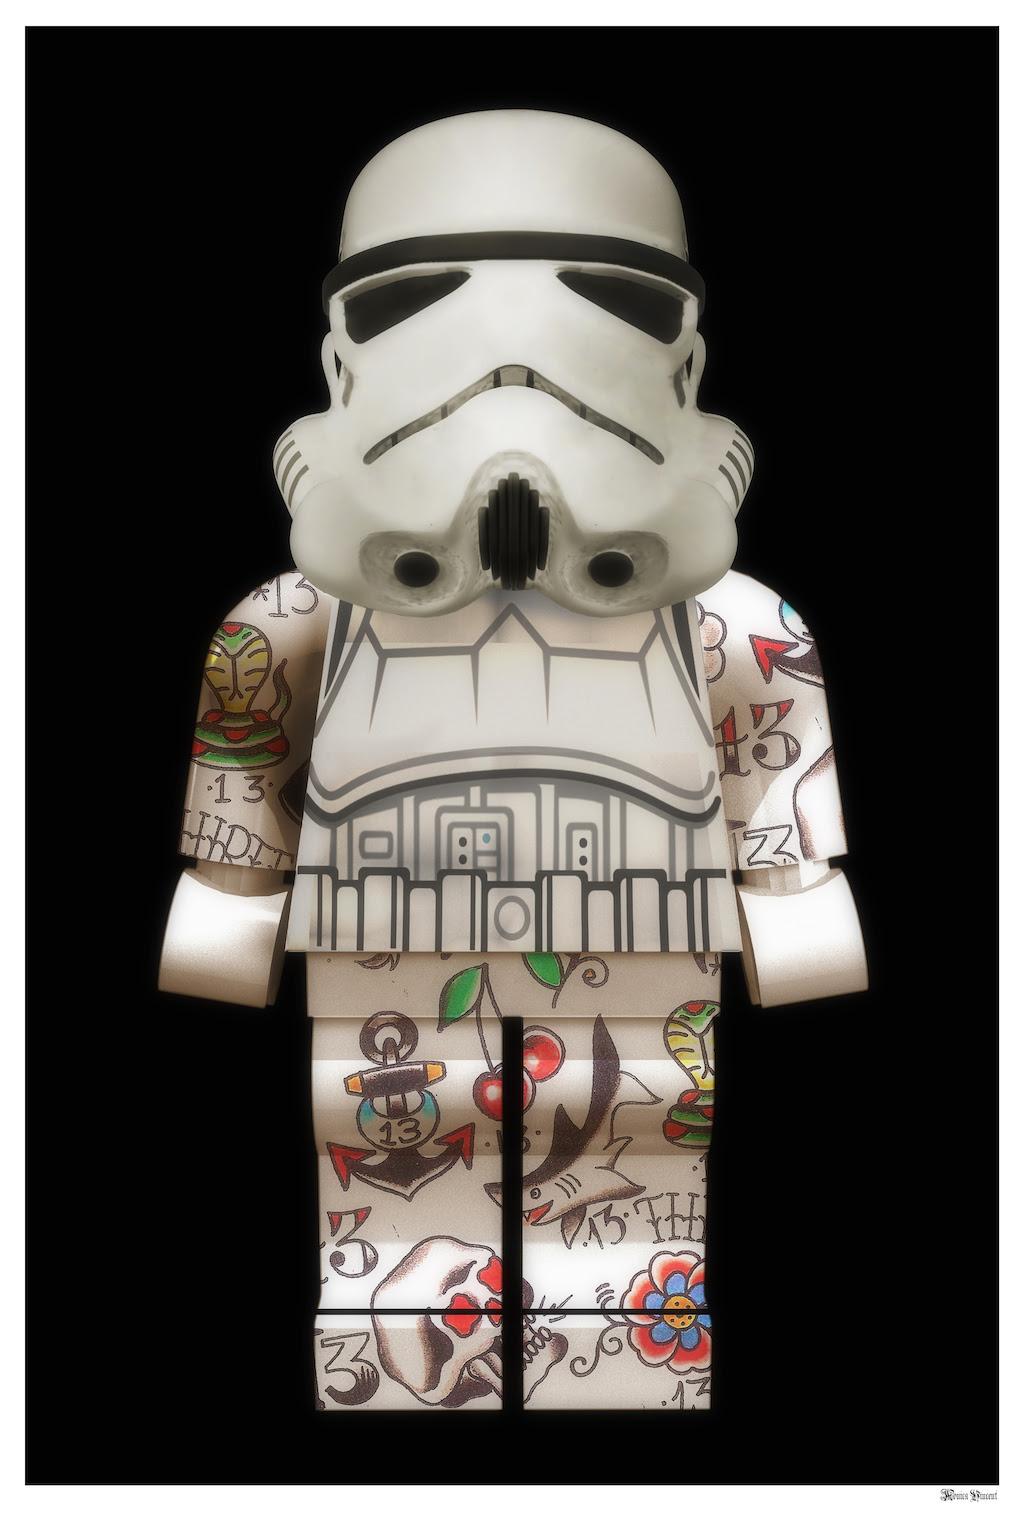 Lego Storm Trooper (Black Background) - Large by Monica Vincent